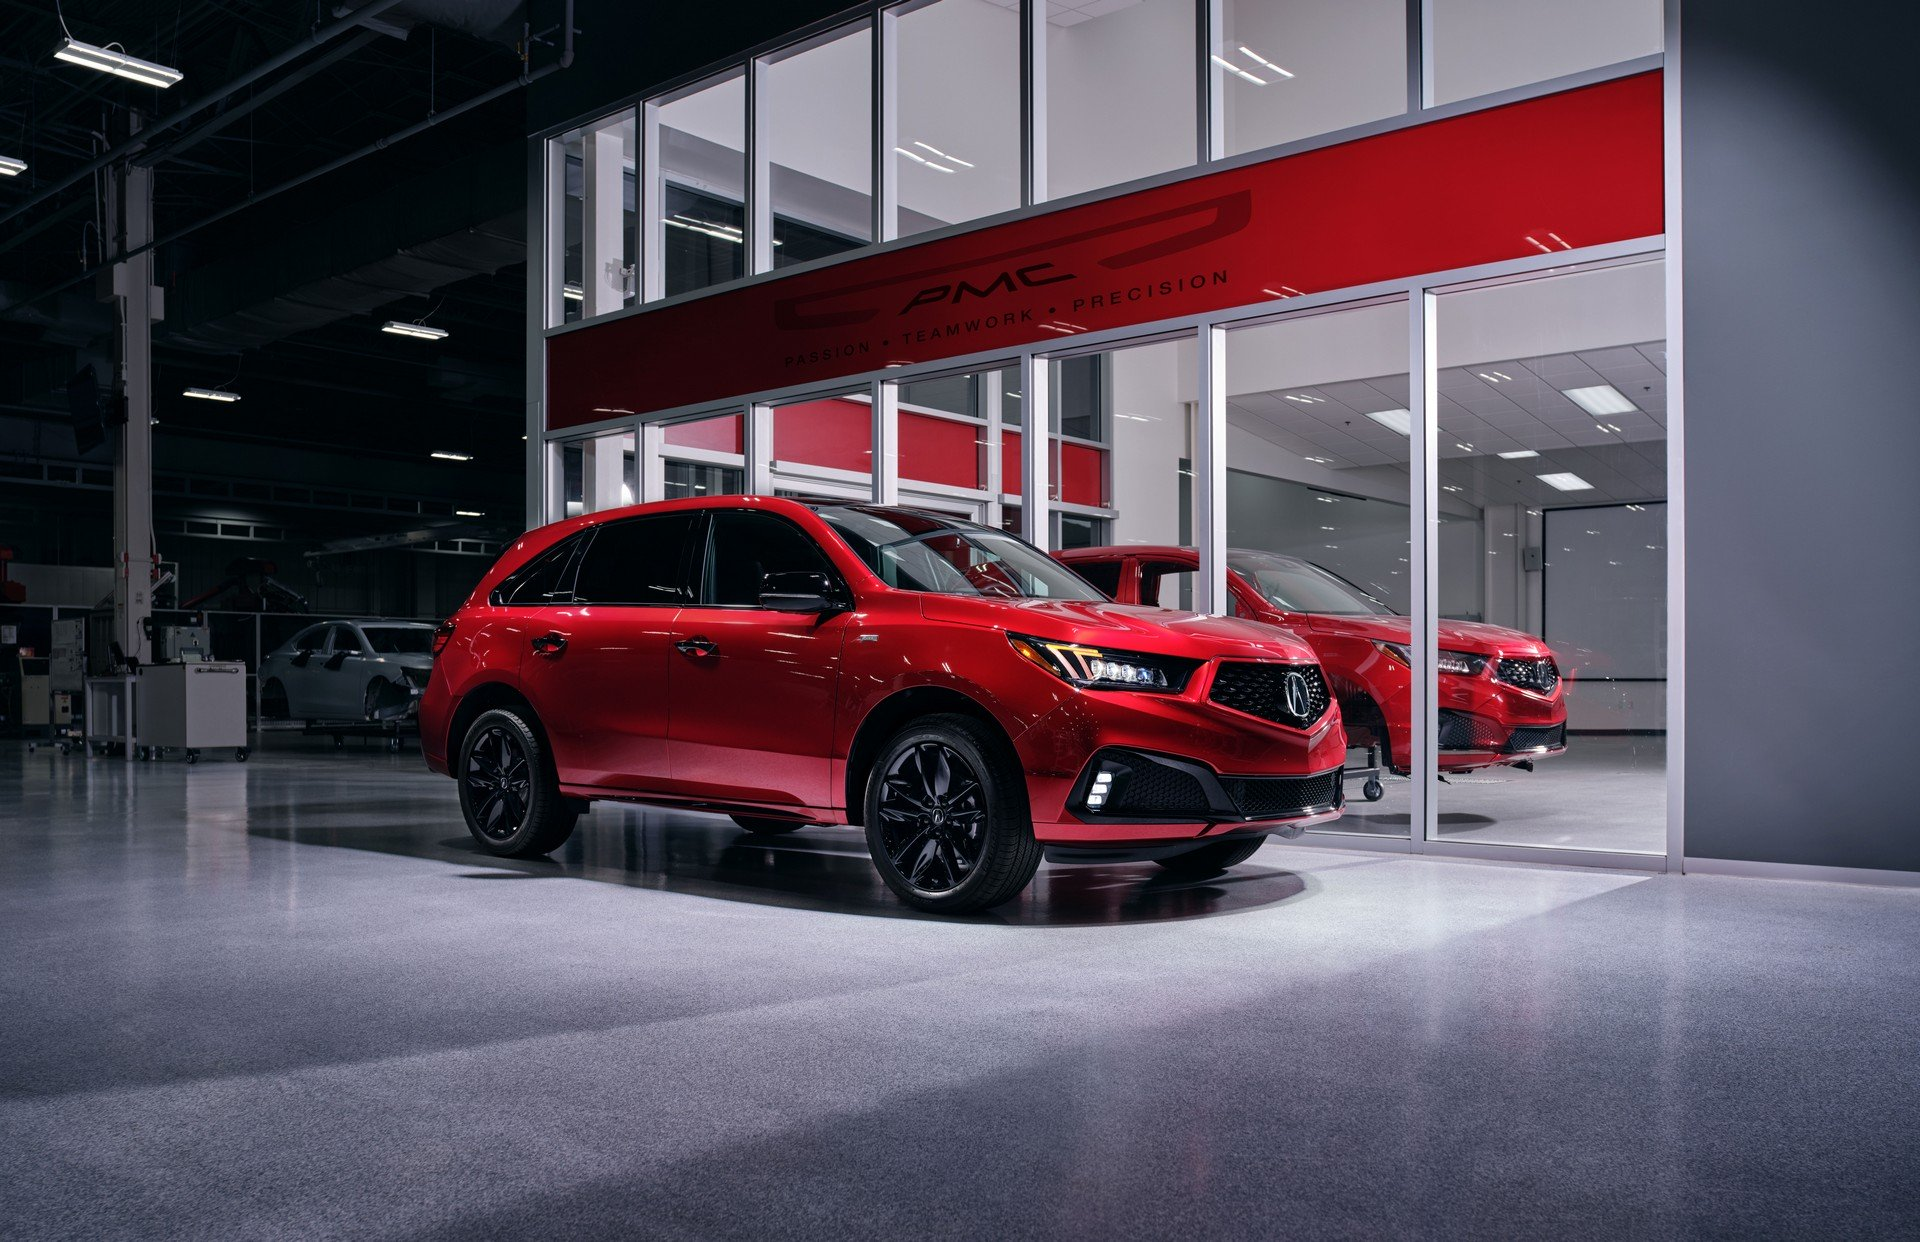 Acura-MDX-PMC-Edition-1